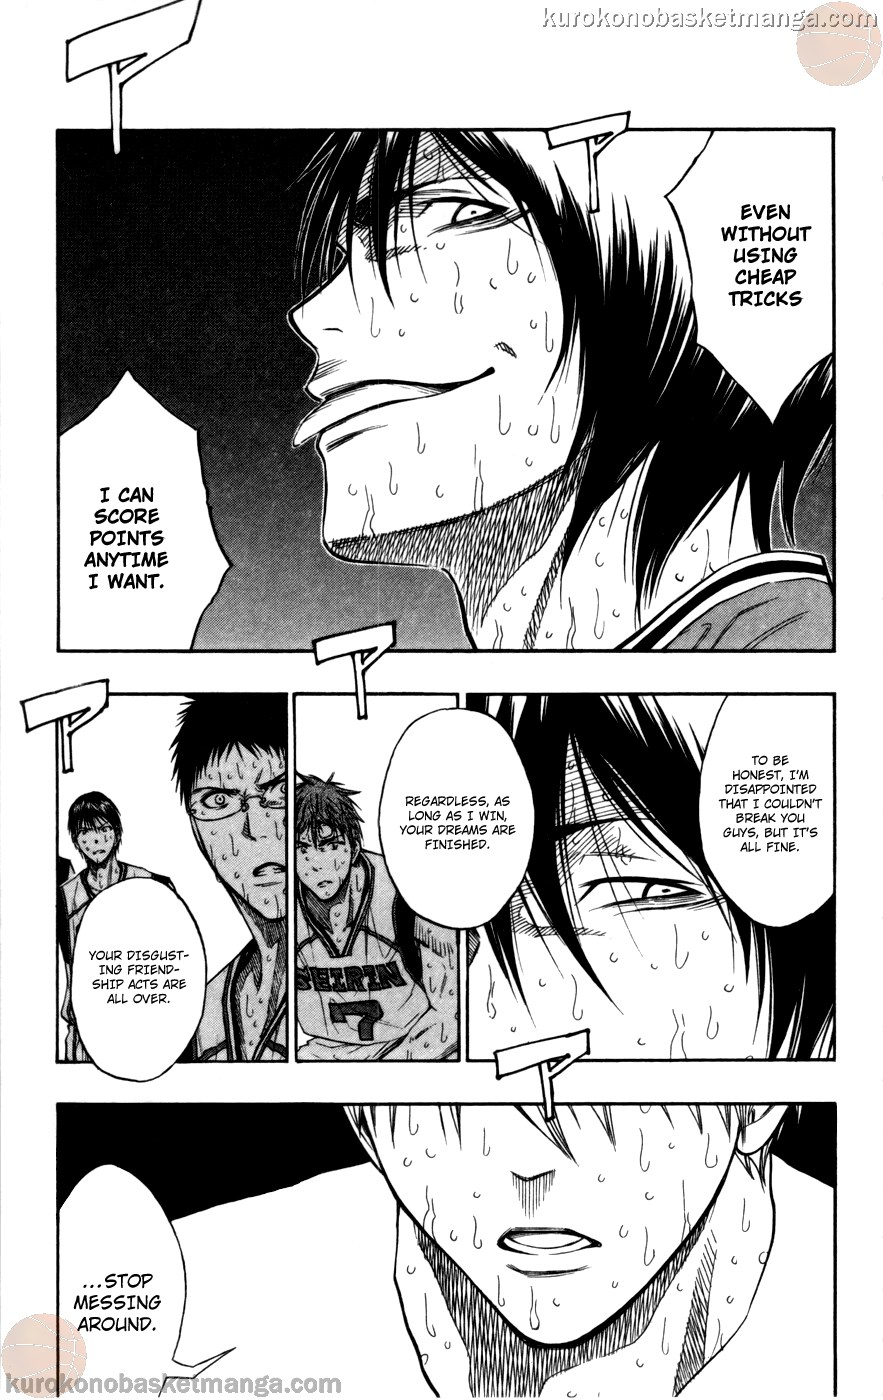 Kuroko no Basket Manga Chapter 107 - Image 09